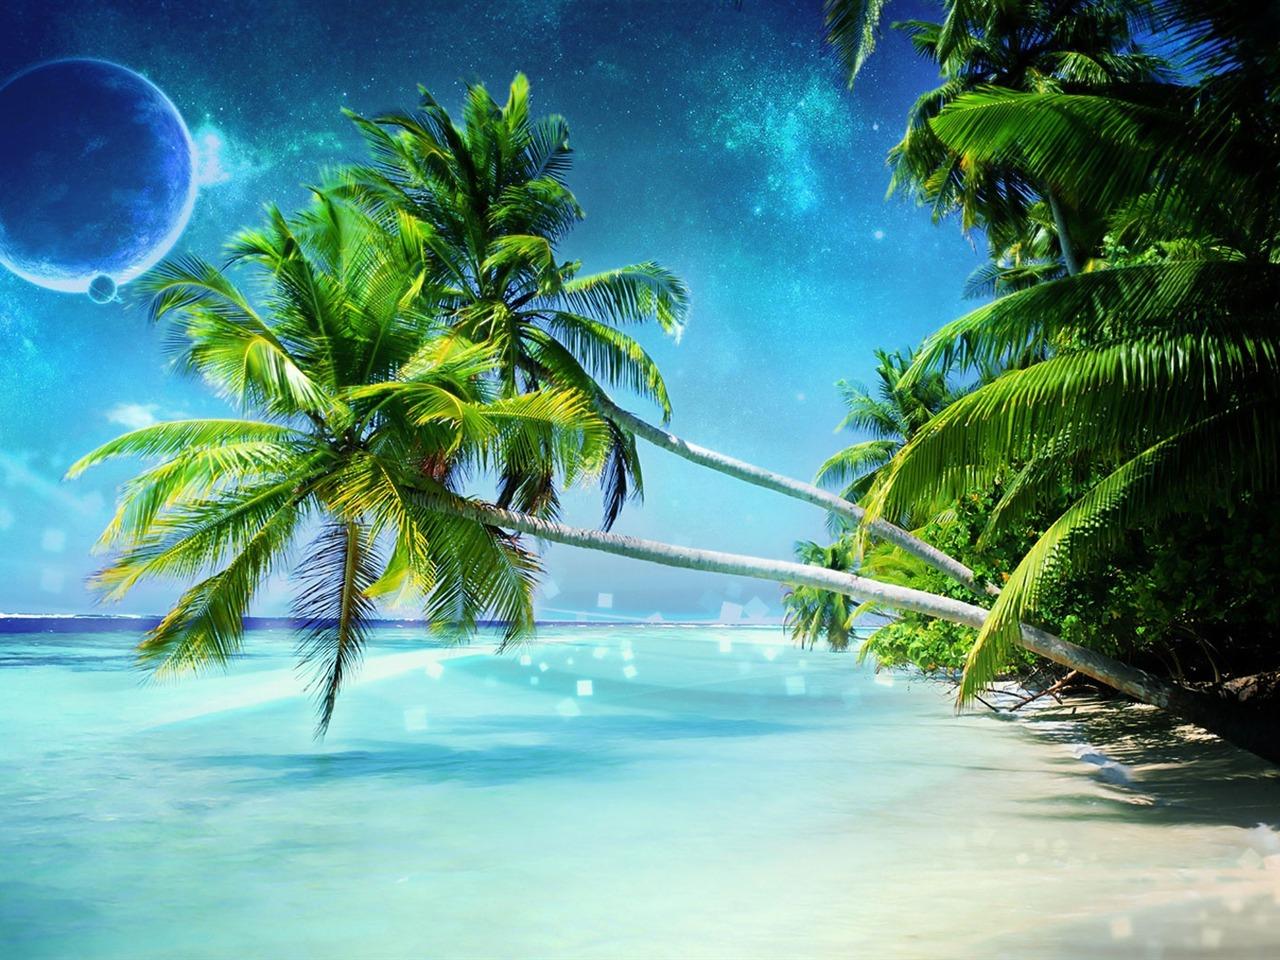 Hd Coconut Tree Seaside Landscape Nature Wallpaper Living: Plage De Rêve-Nature Paysage Bureau Wallpaper Aperçu